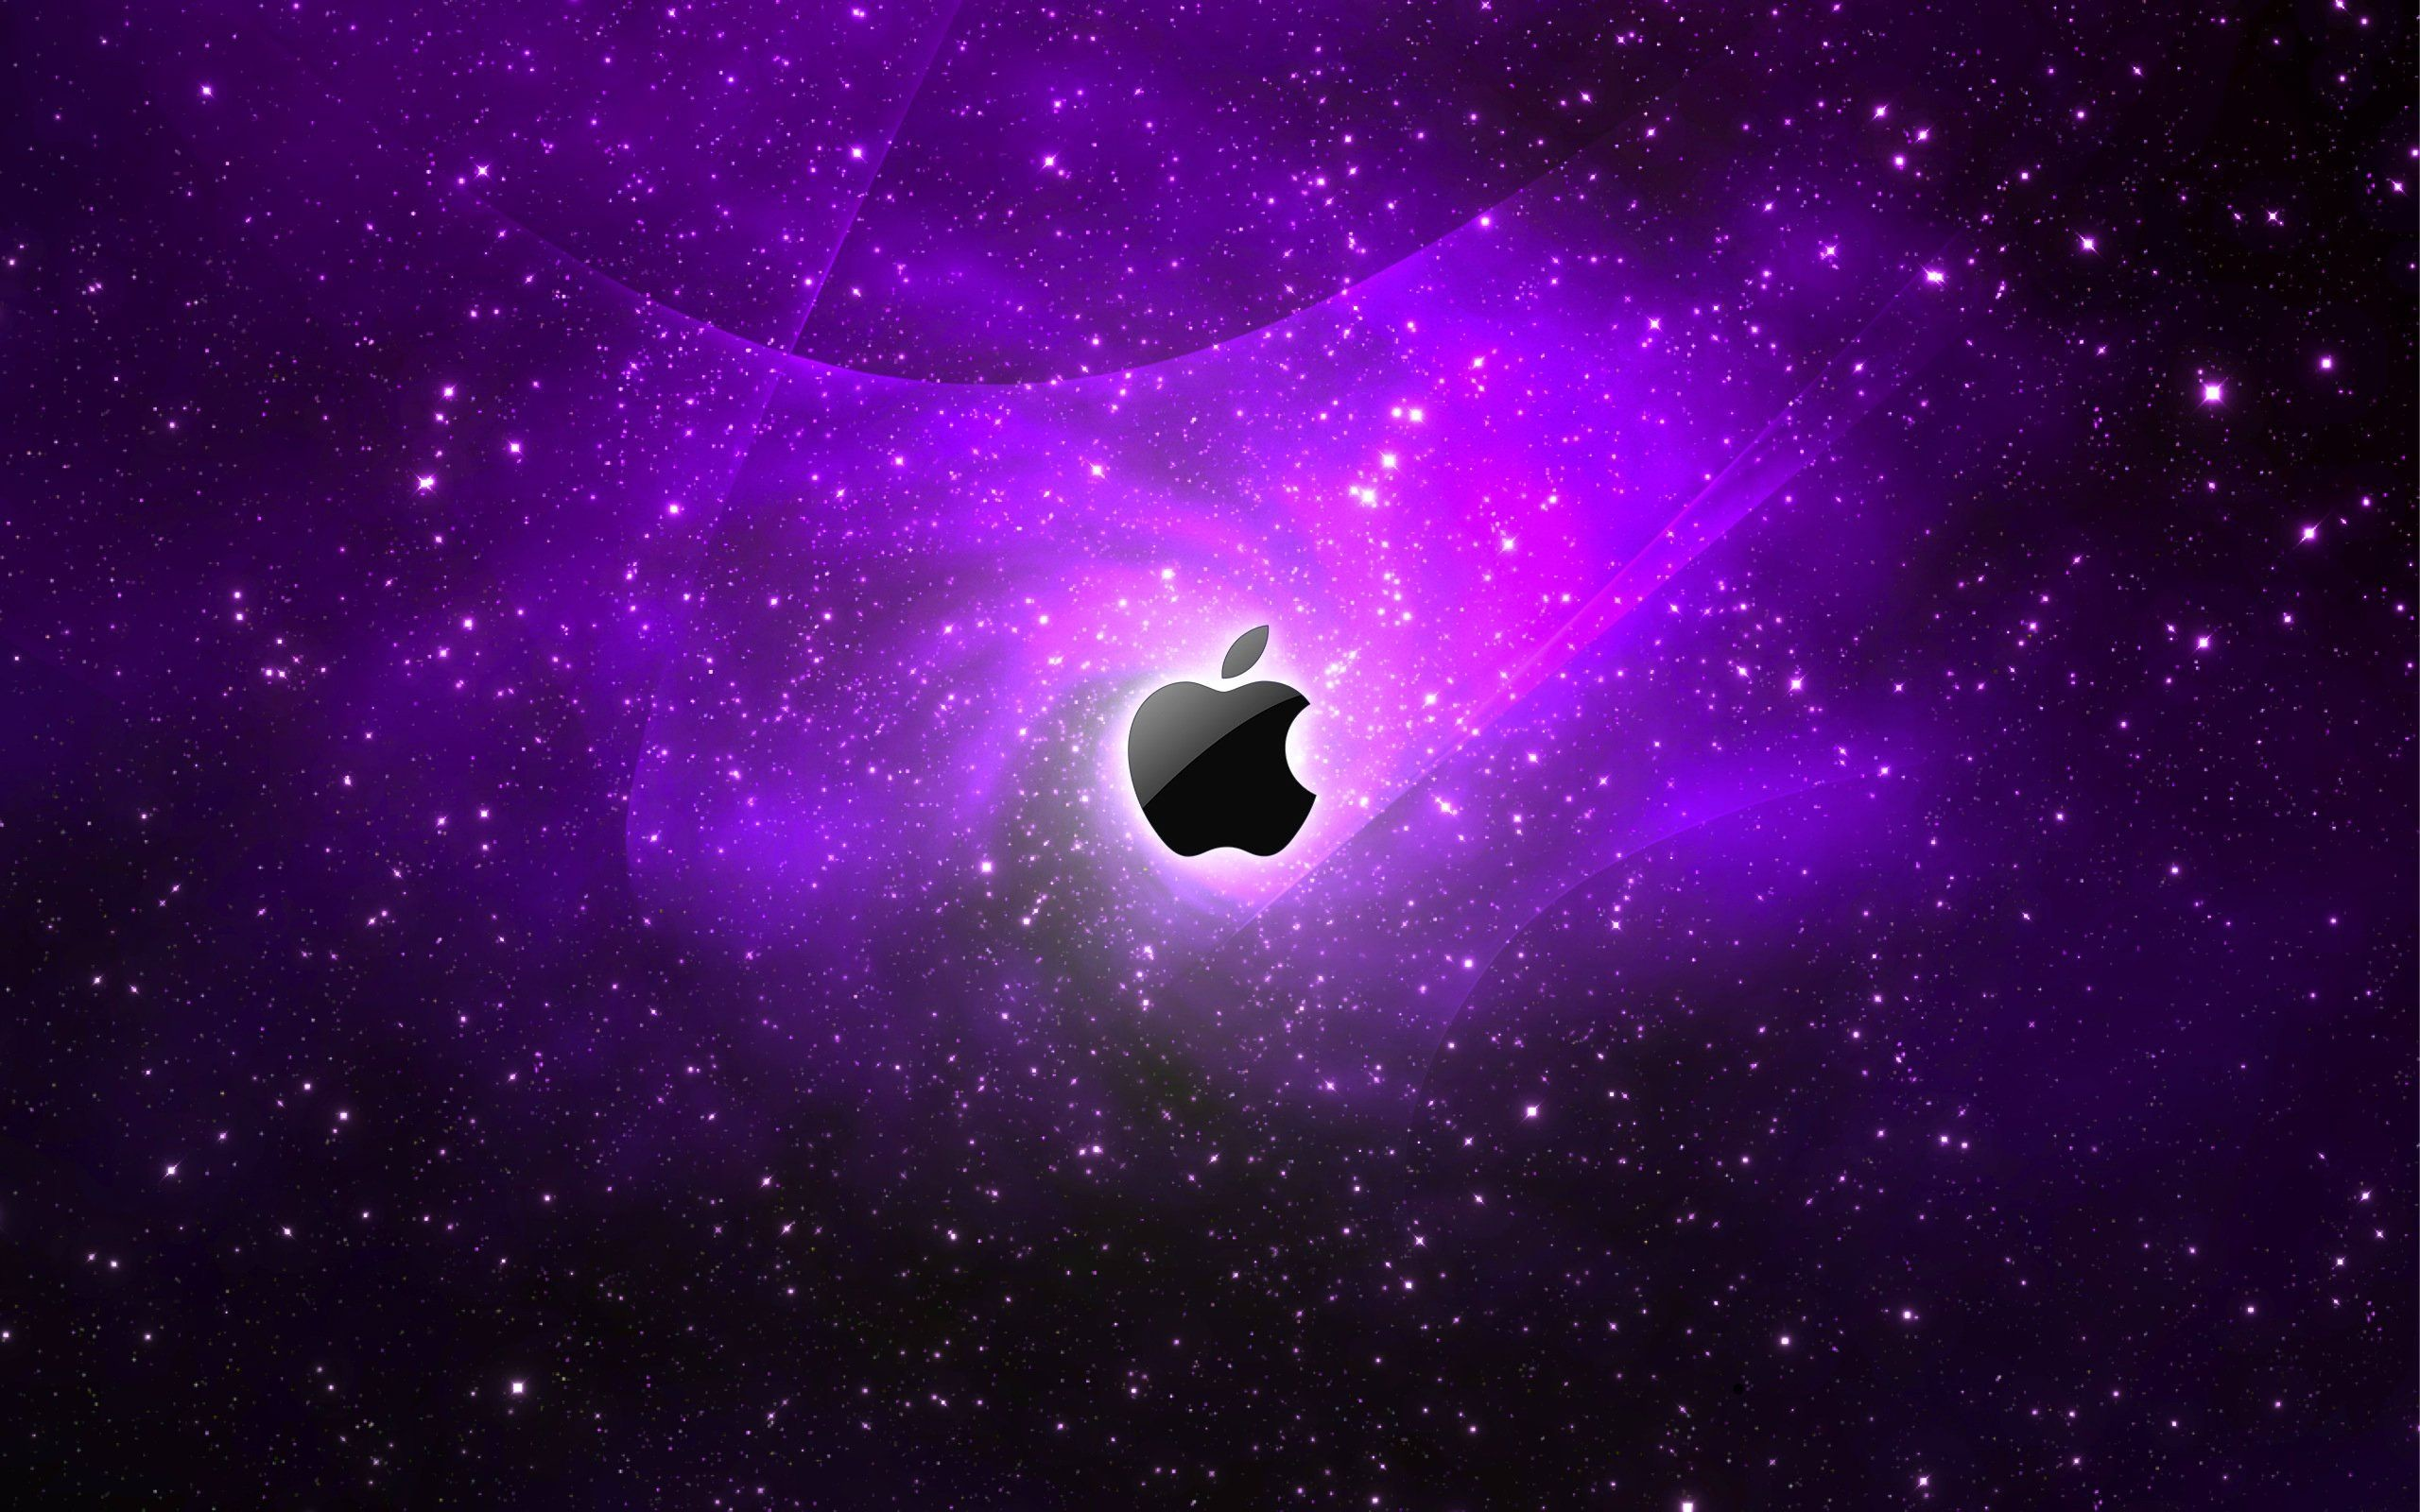 Purple Galaxy Wallpaper High Resolution